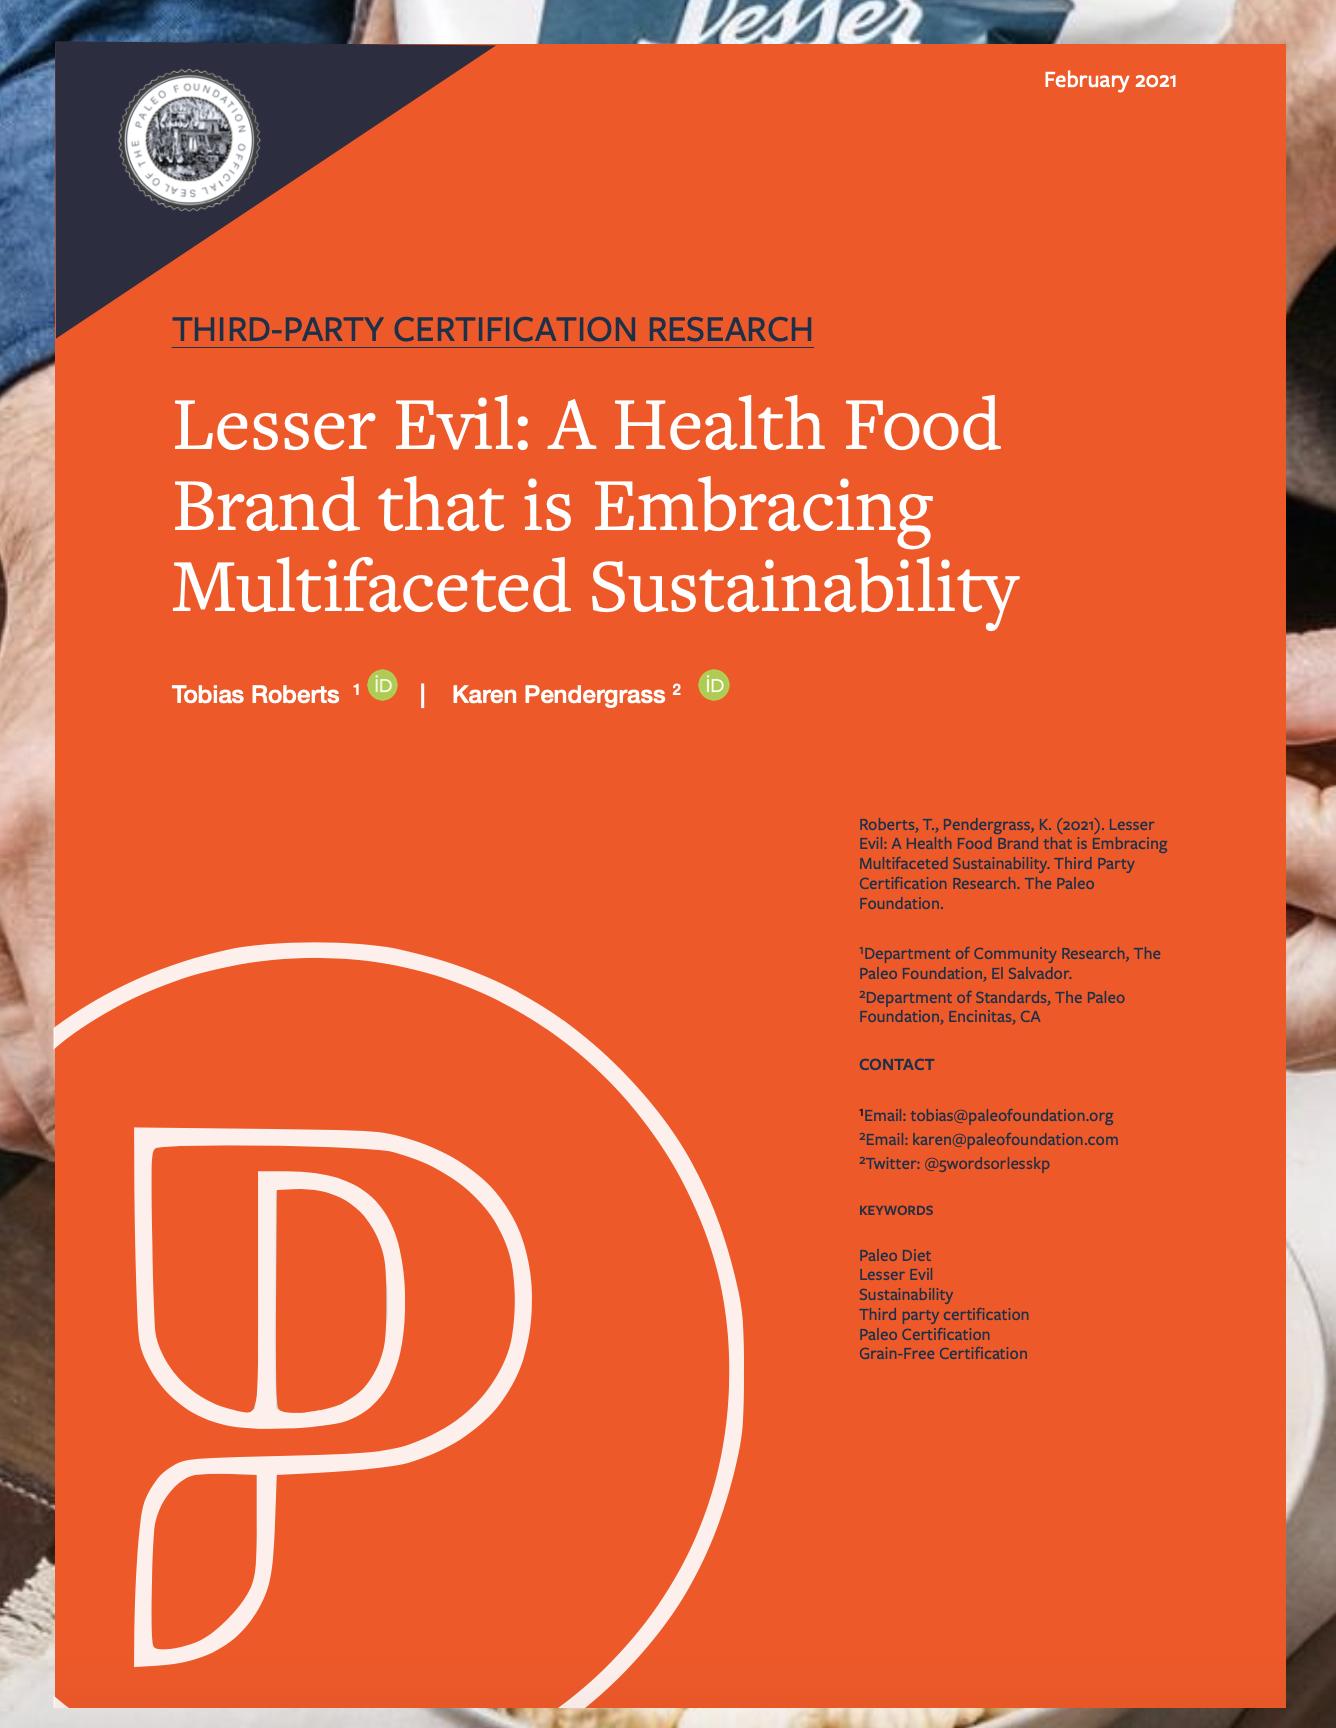 Lesser Evil Grain-Free Certified Case Study